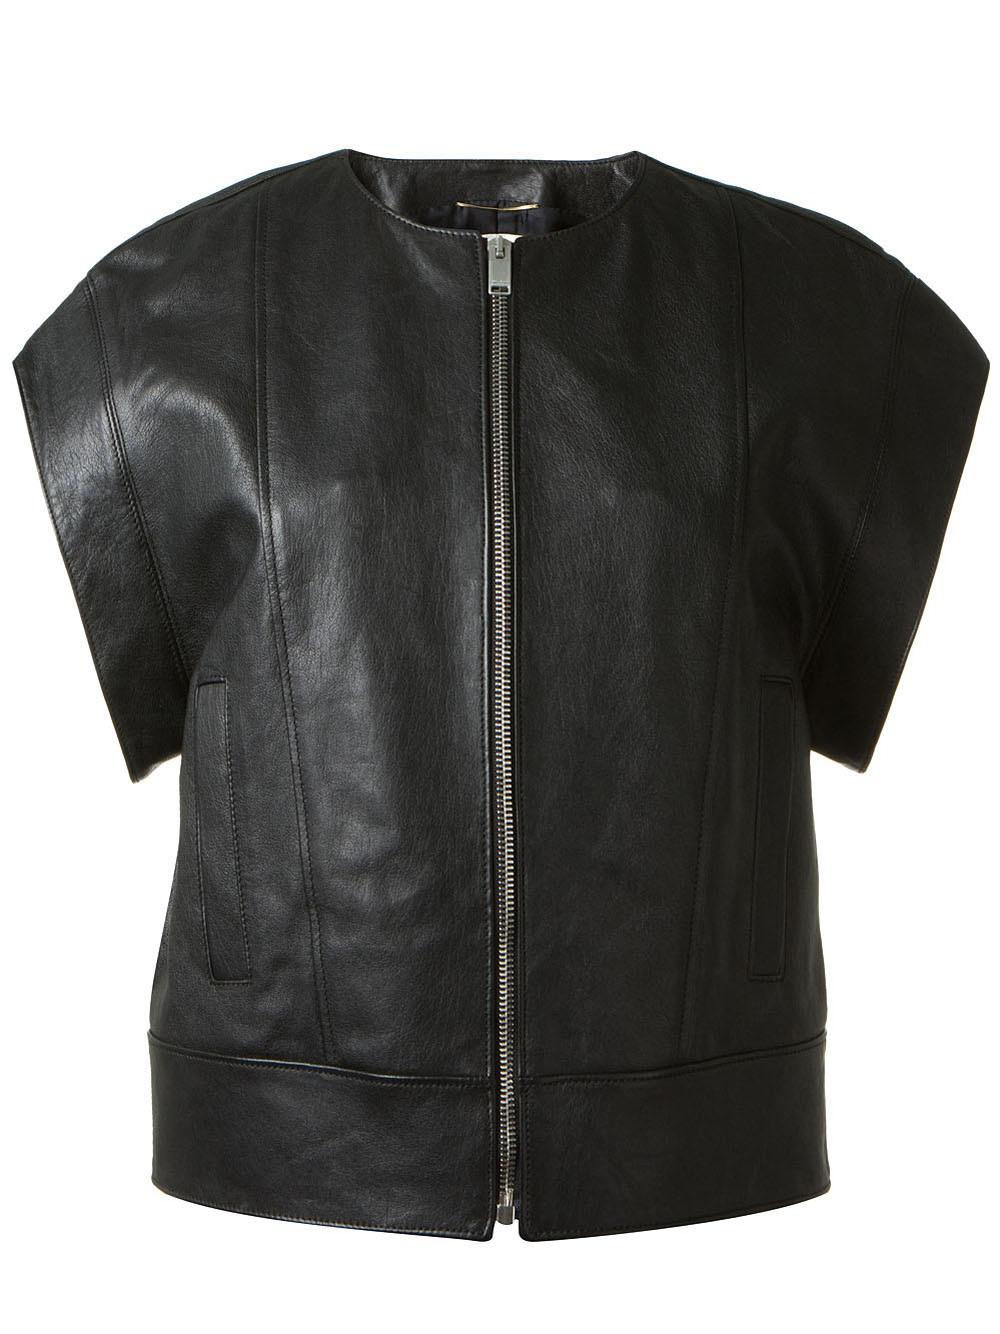 pennyblack_Lyst - Saint laurent Short Sleeve Leather Jacket in Black